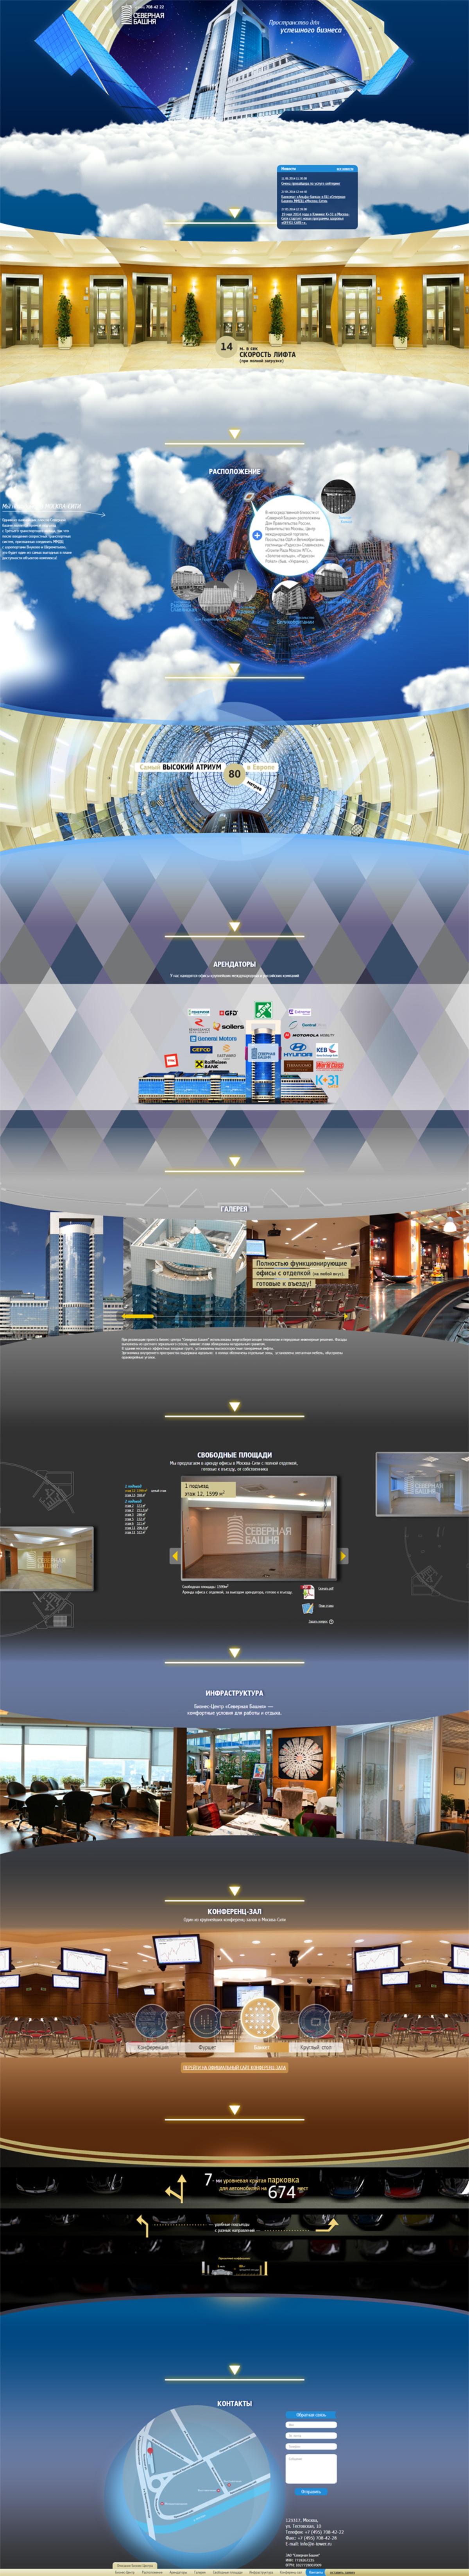 n-tower.ru / Проект компании Redsoft